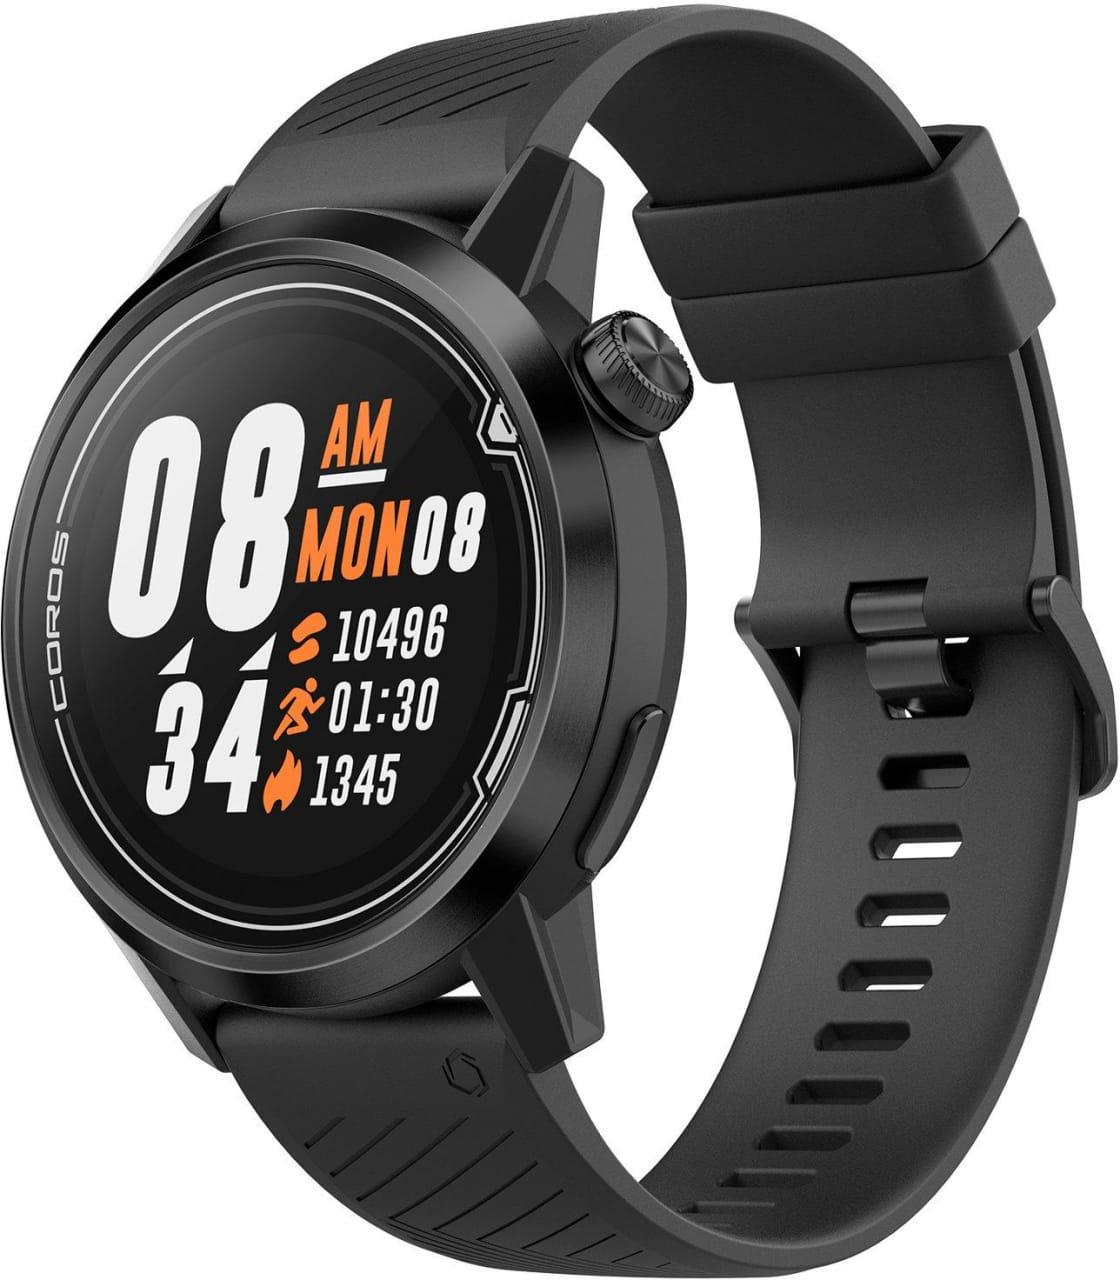 Športové hodinky Coros APEX Premium Multisport GPS Watch - 46mm